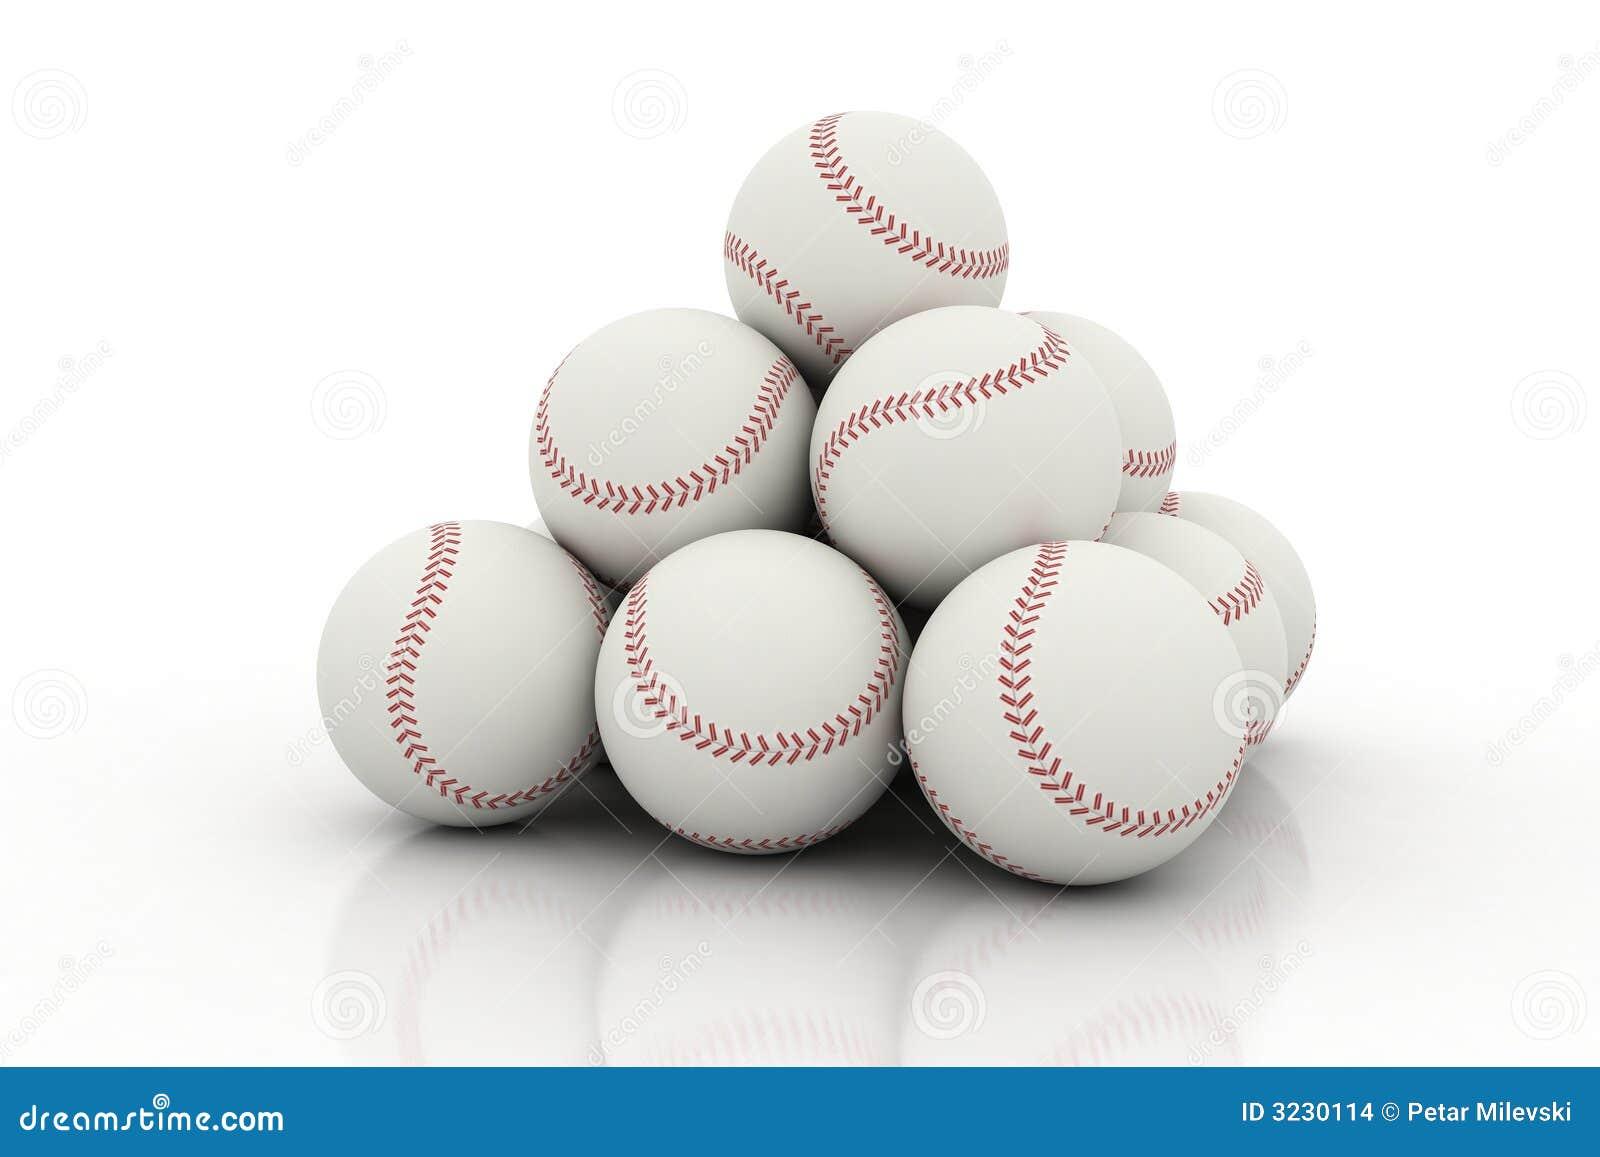 Pile Of Baseball Balls Stock Images - Image: 3230114